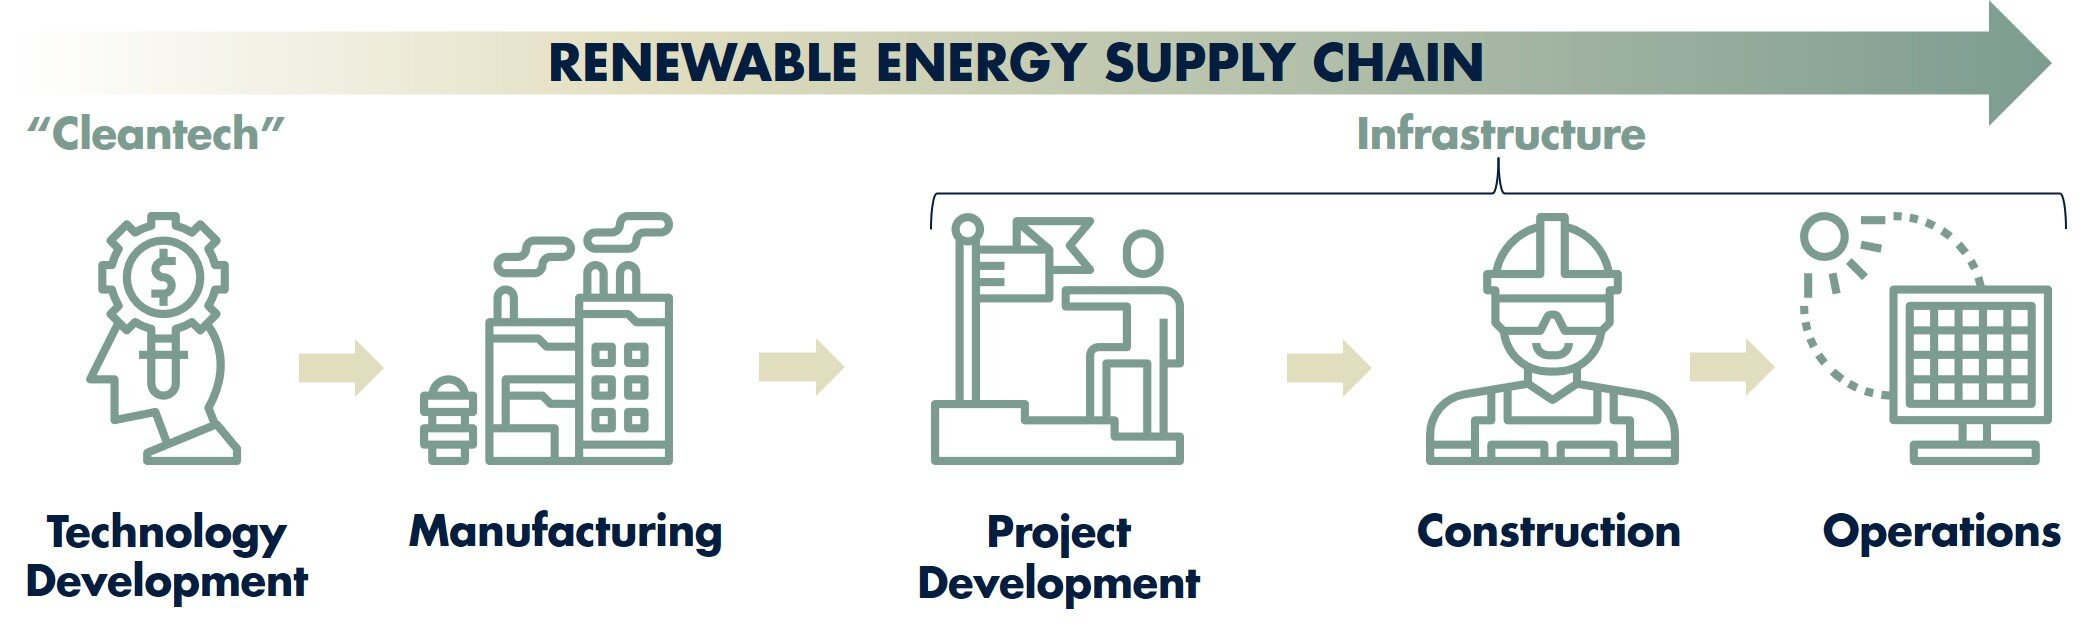 Image 12 - supply chain.jpg